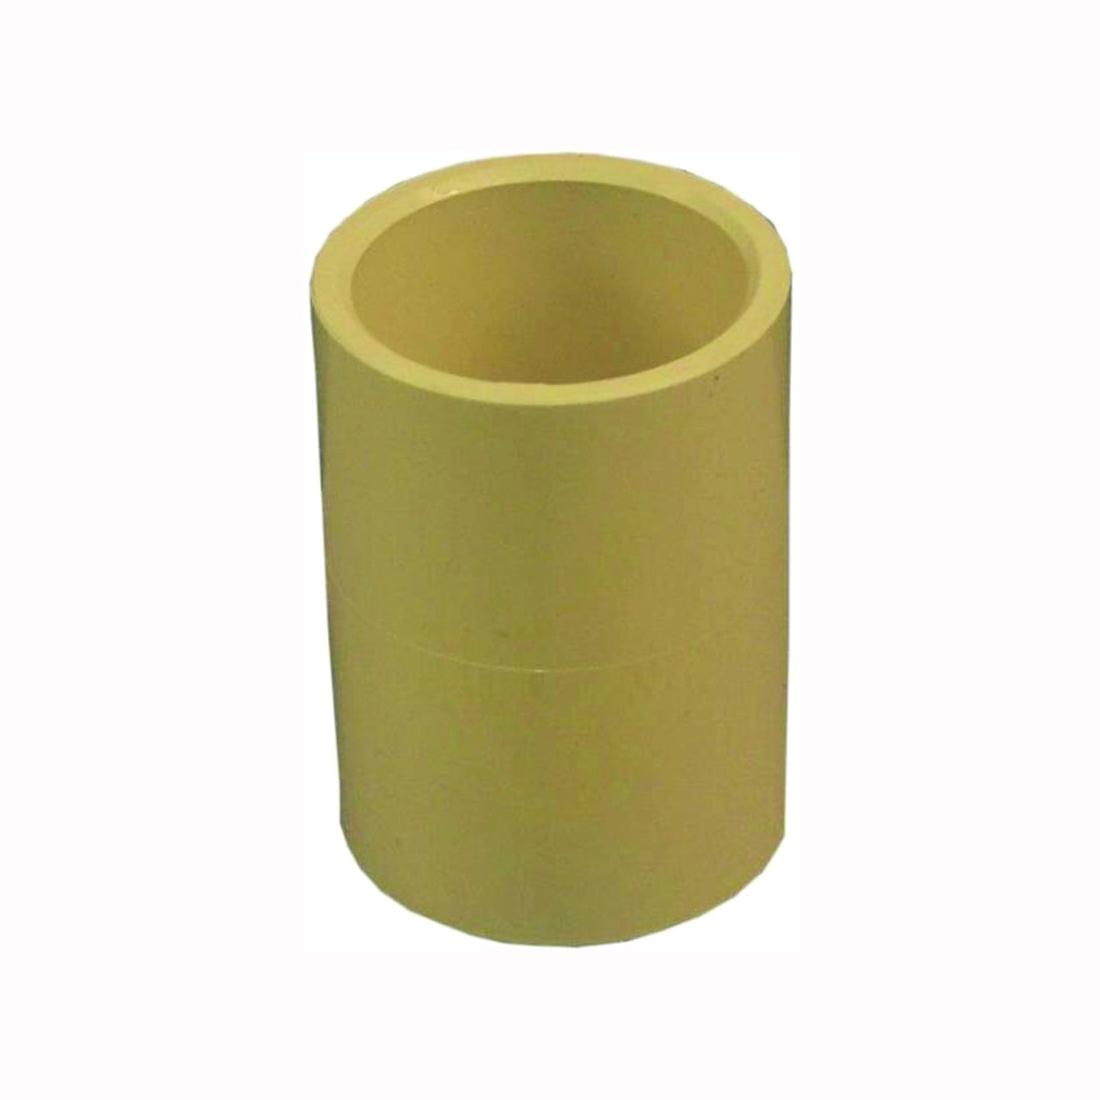 Picture of GENOVA 500 Series 50105CP Tube Coupler, 1/2 in Slip Joint